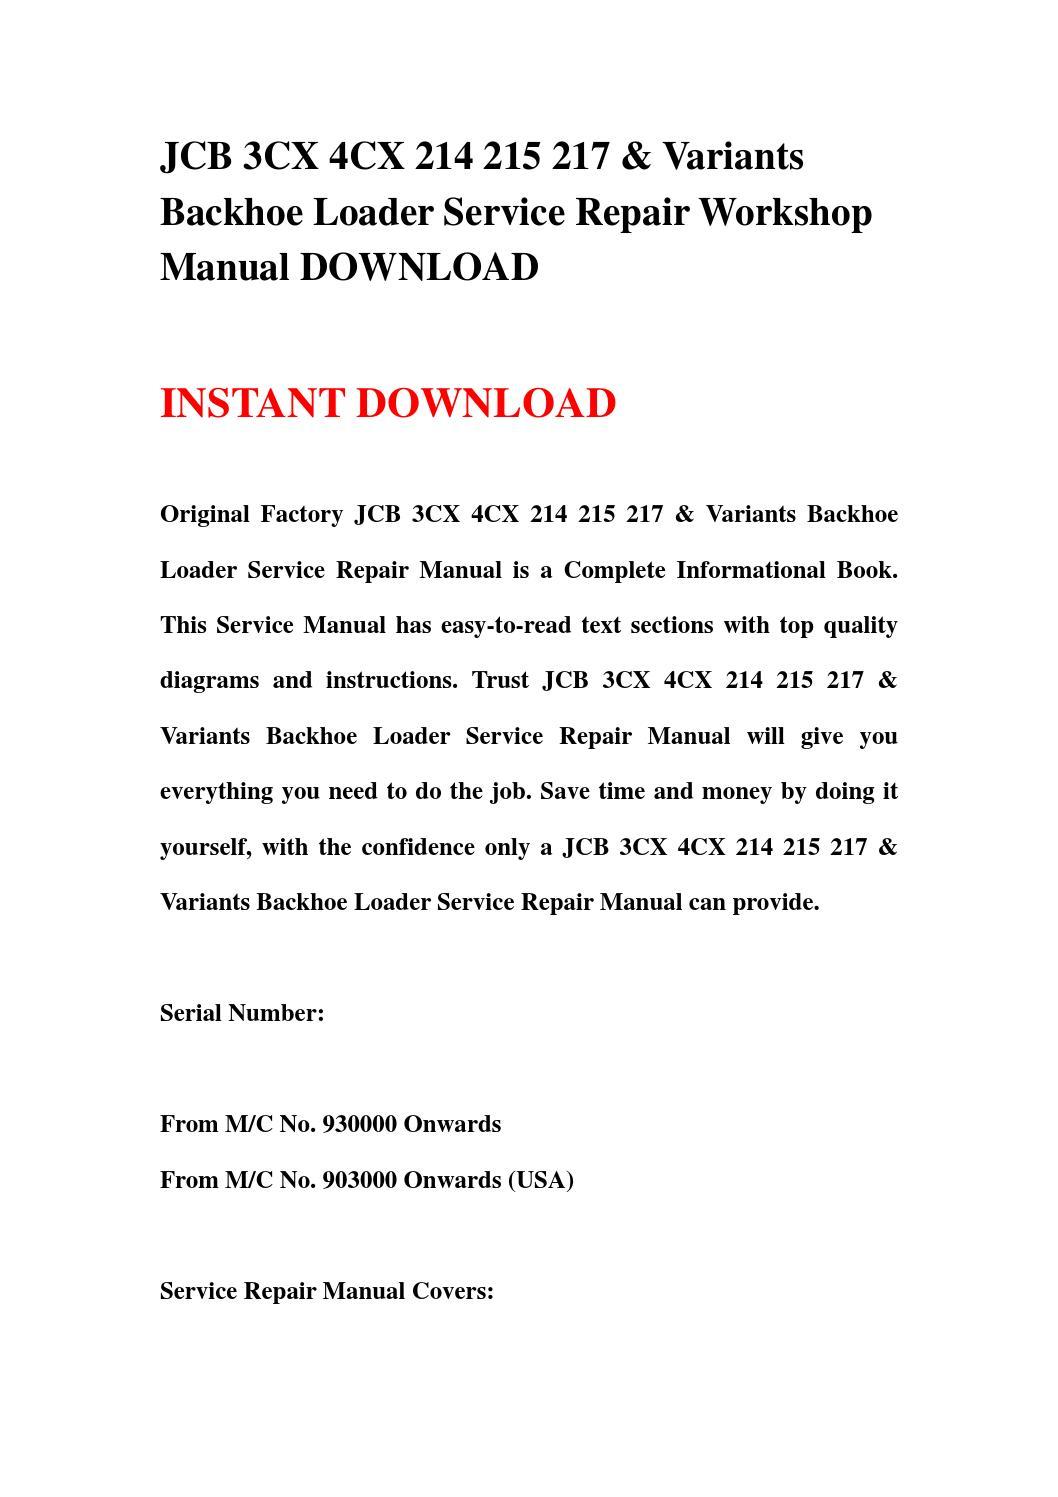 Jcb 3cx 4cx 214 215 217 & variants backhoe loader service repair workshop  manual download by fhhsgebfhn - issuu